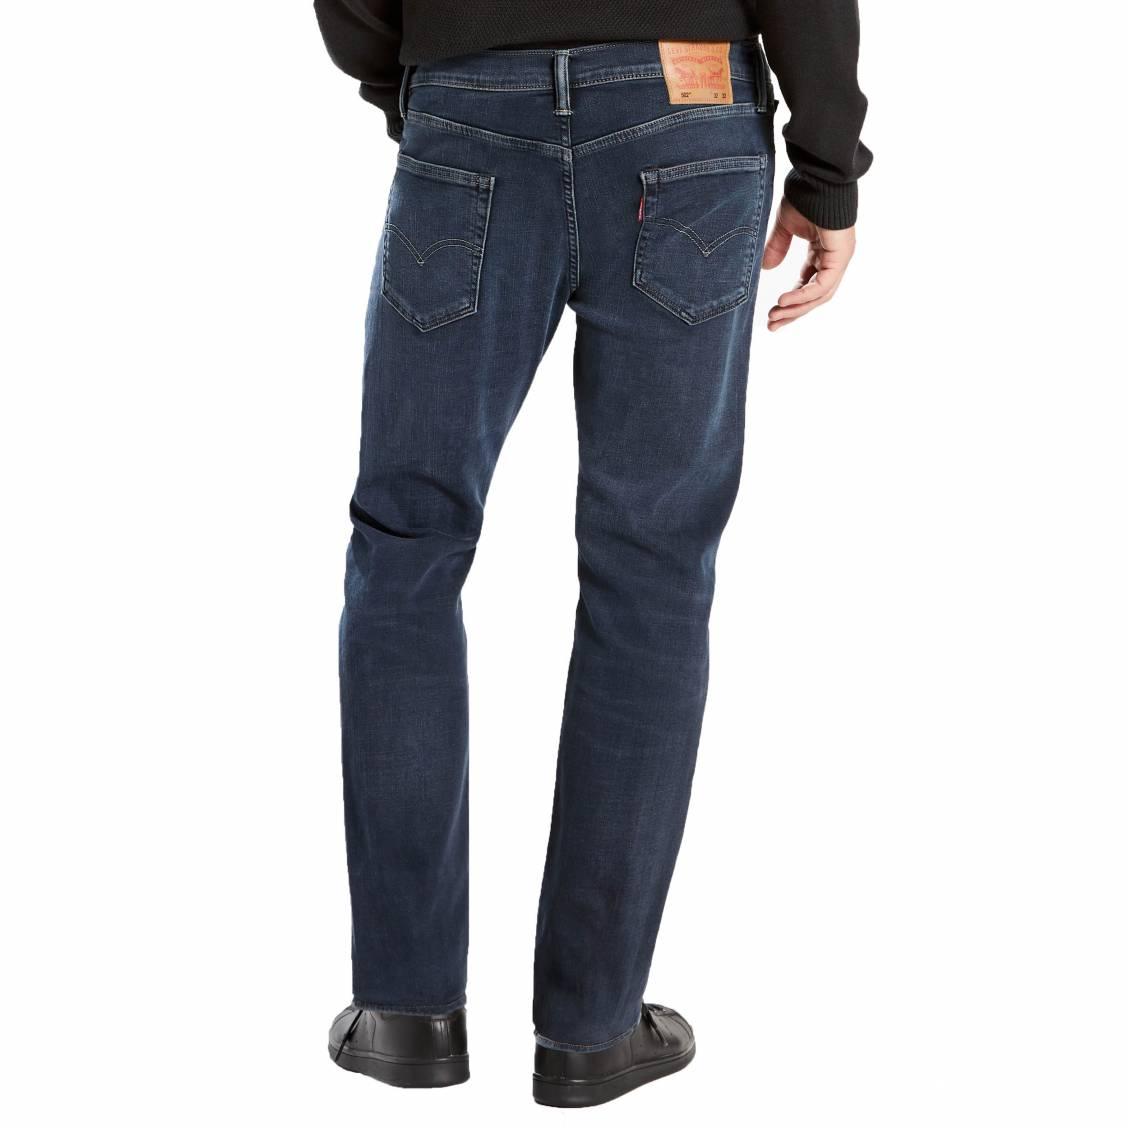 f15aadf156547 ... Jeans Levi s 502 regular taper Eyser Stretch en coton stretch bleu foncé